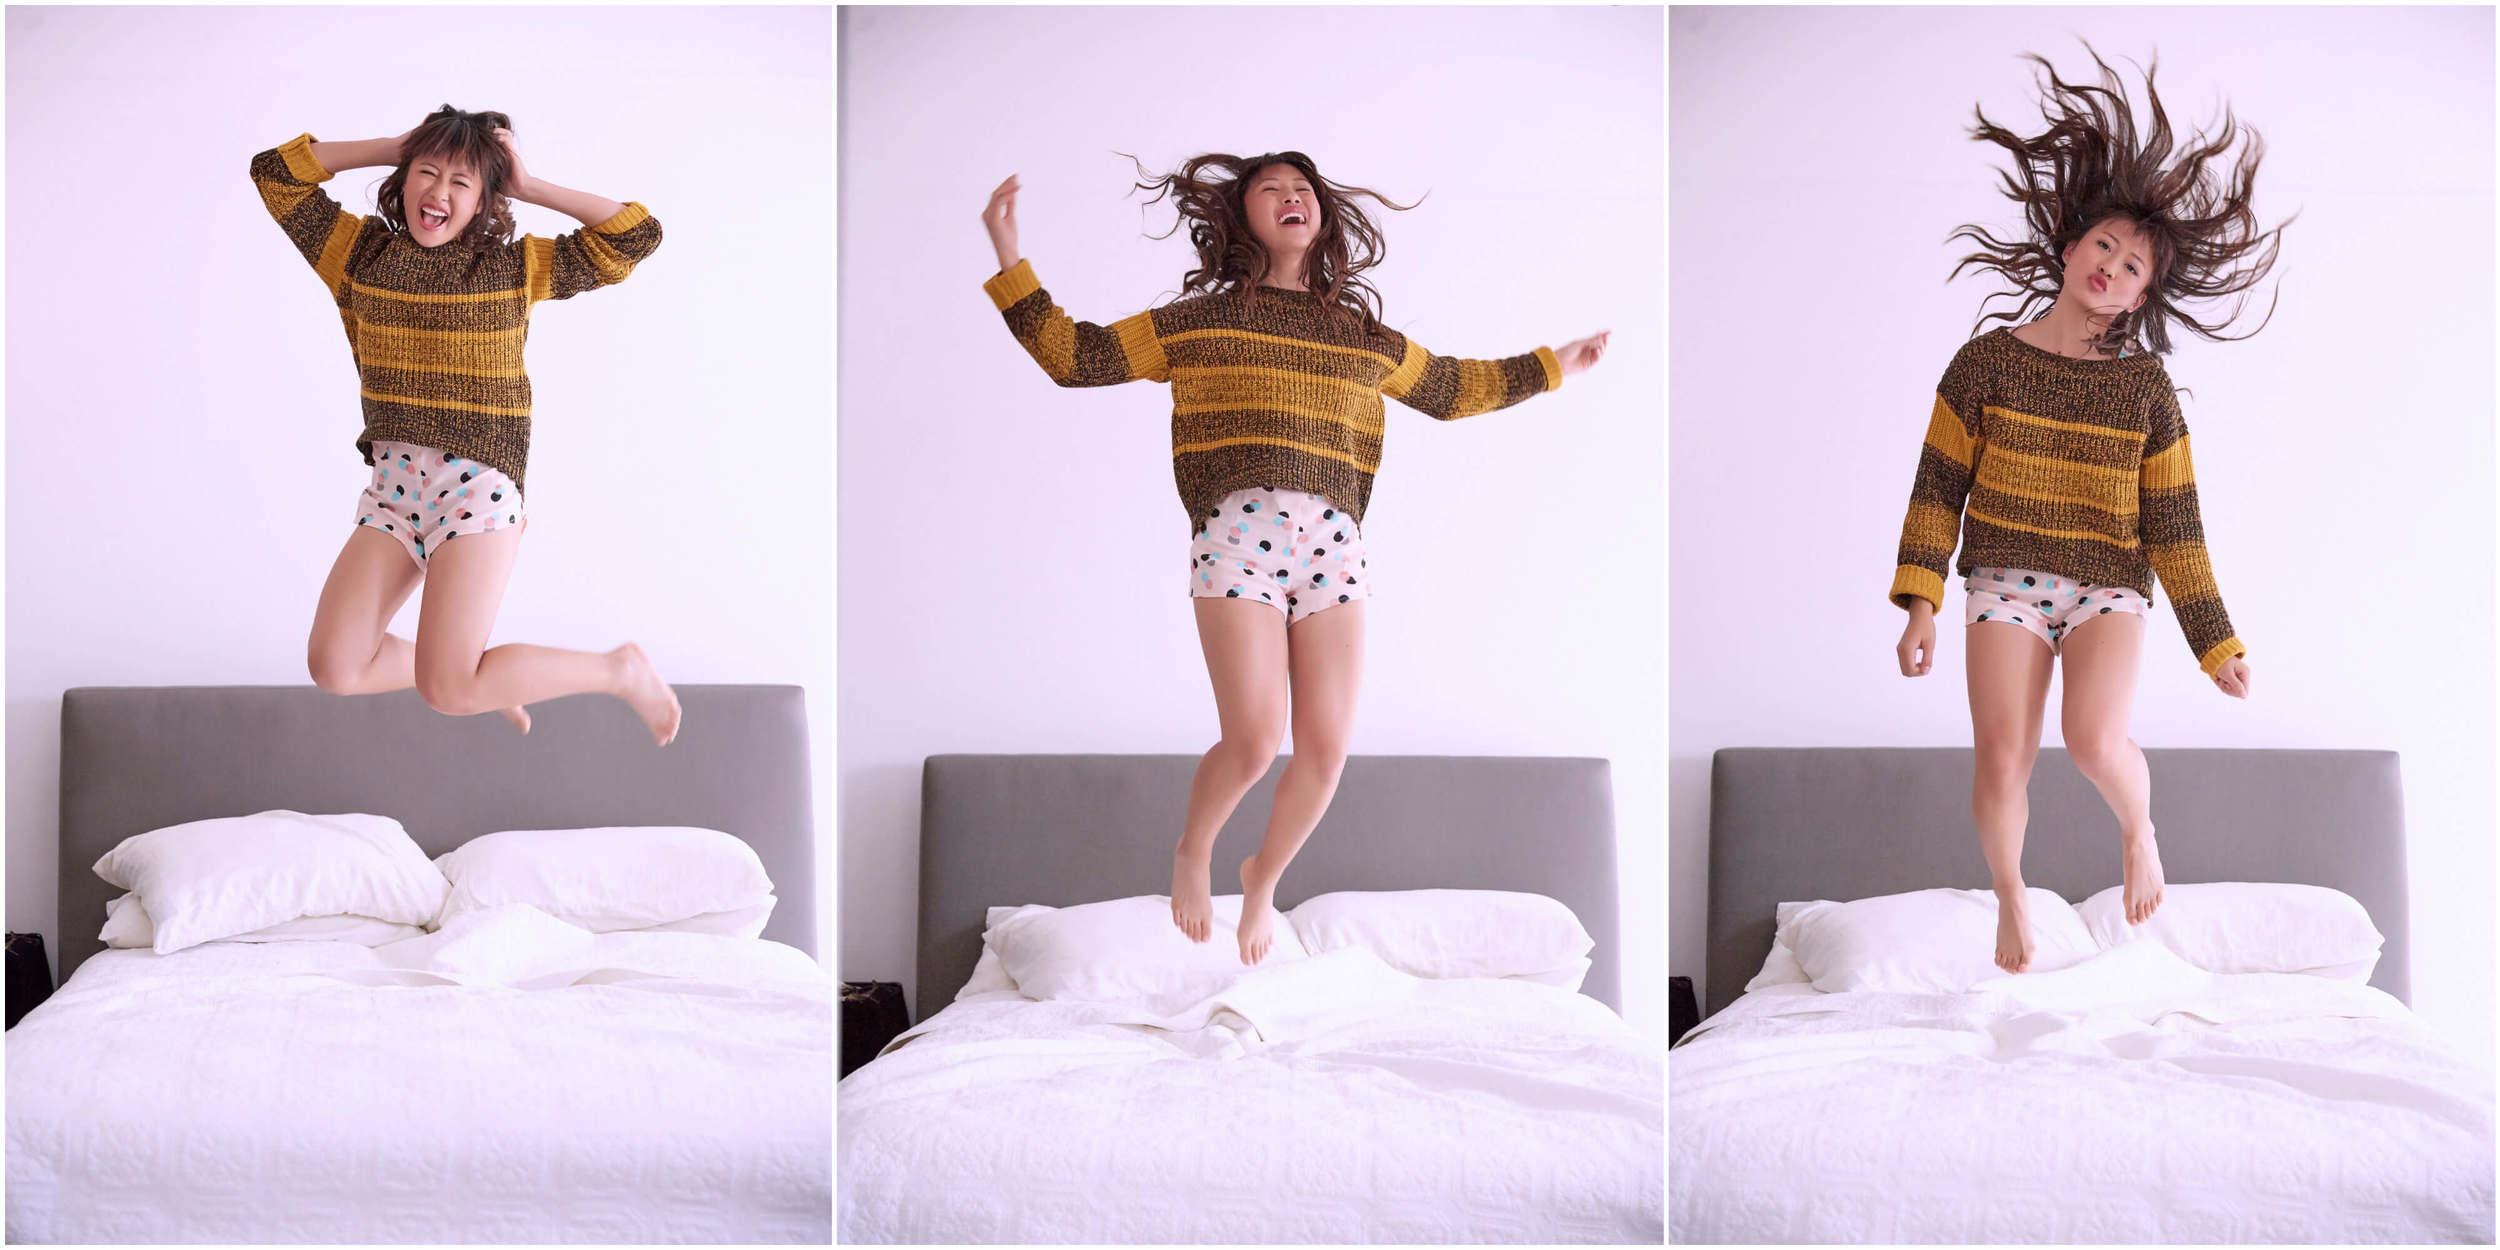 Haley Collage 2.jpg